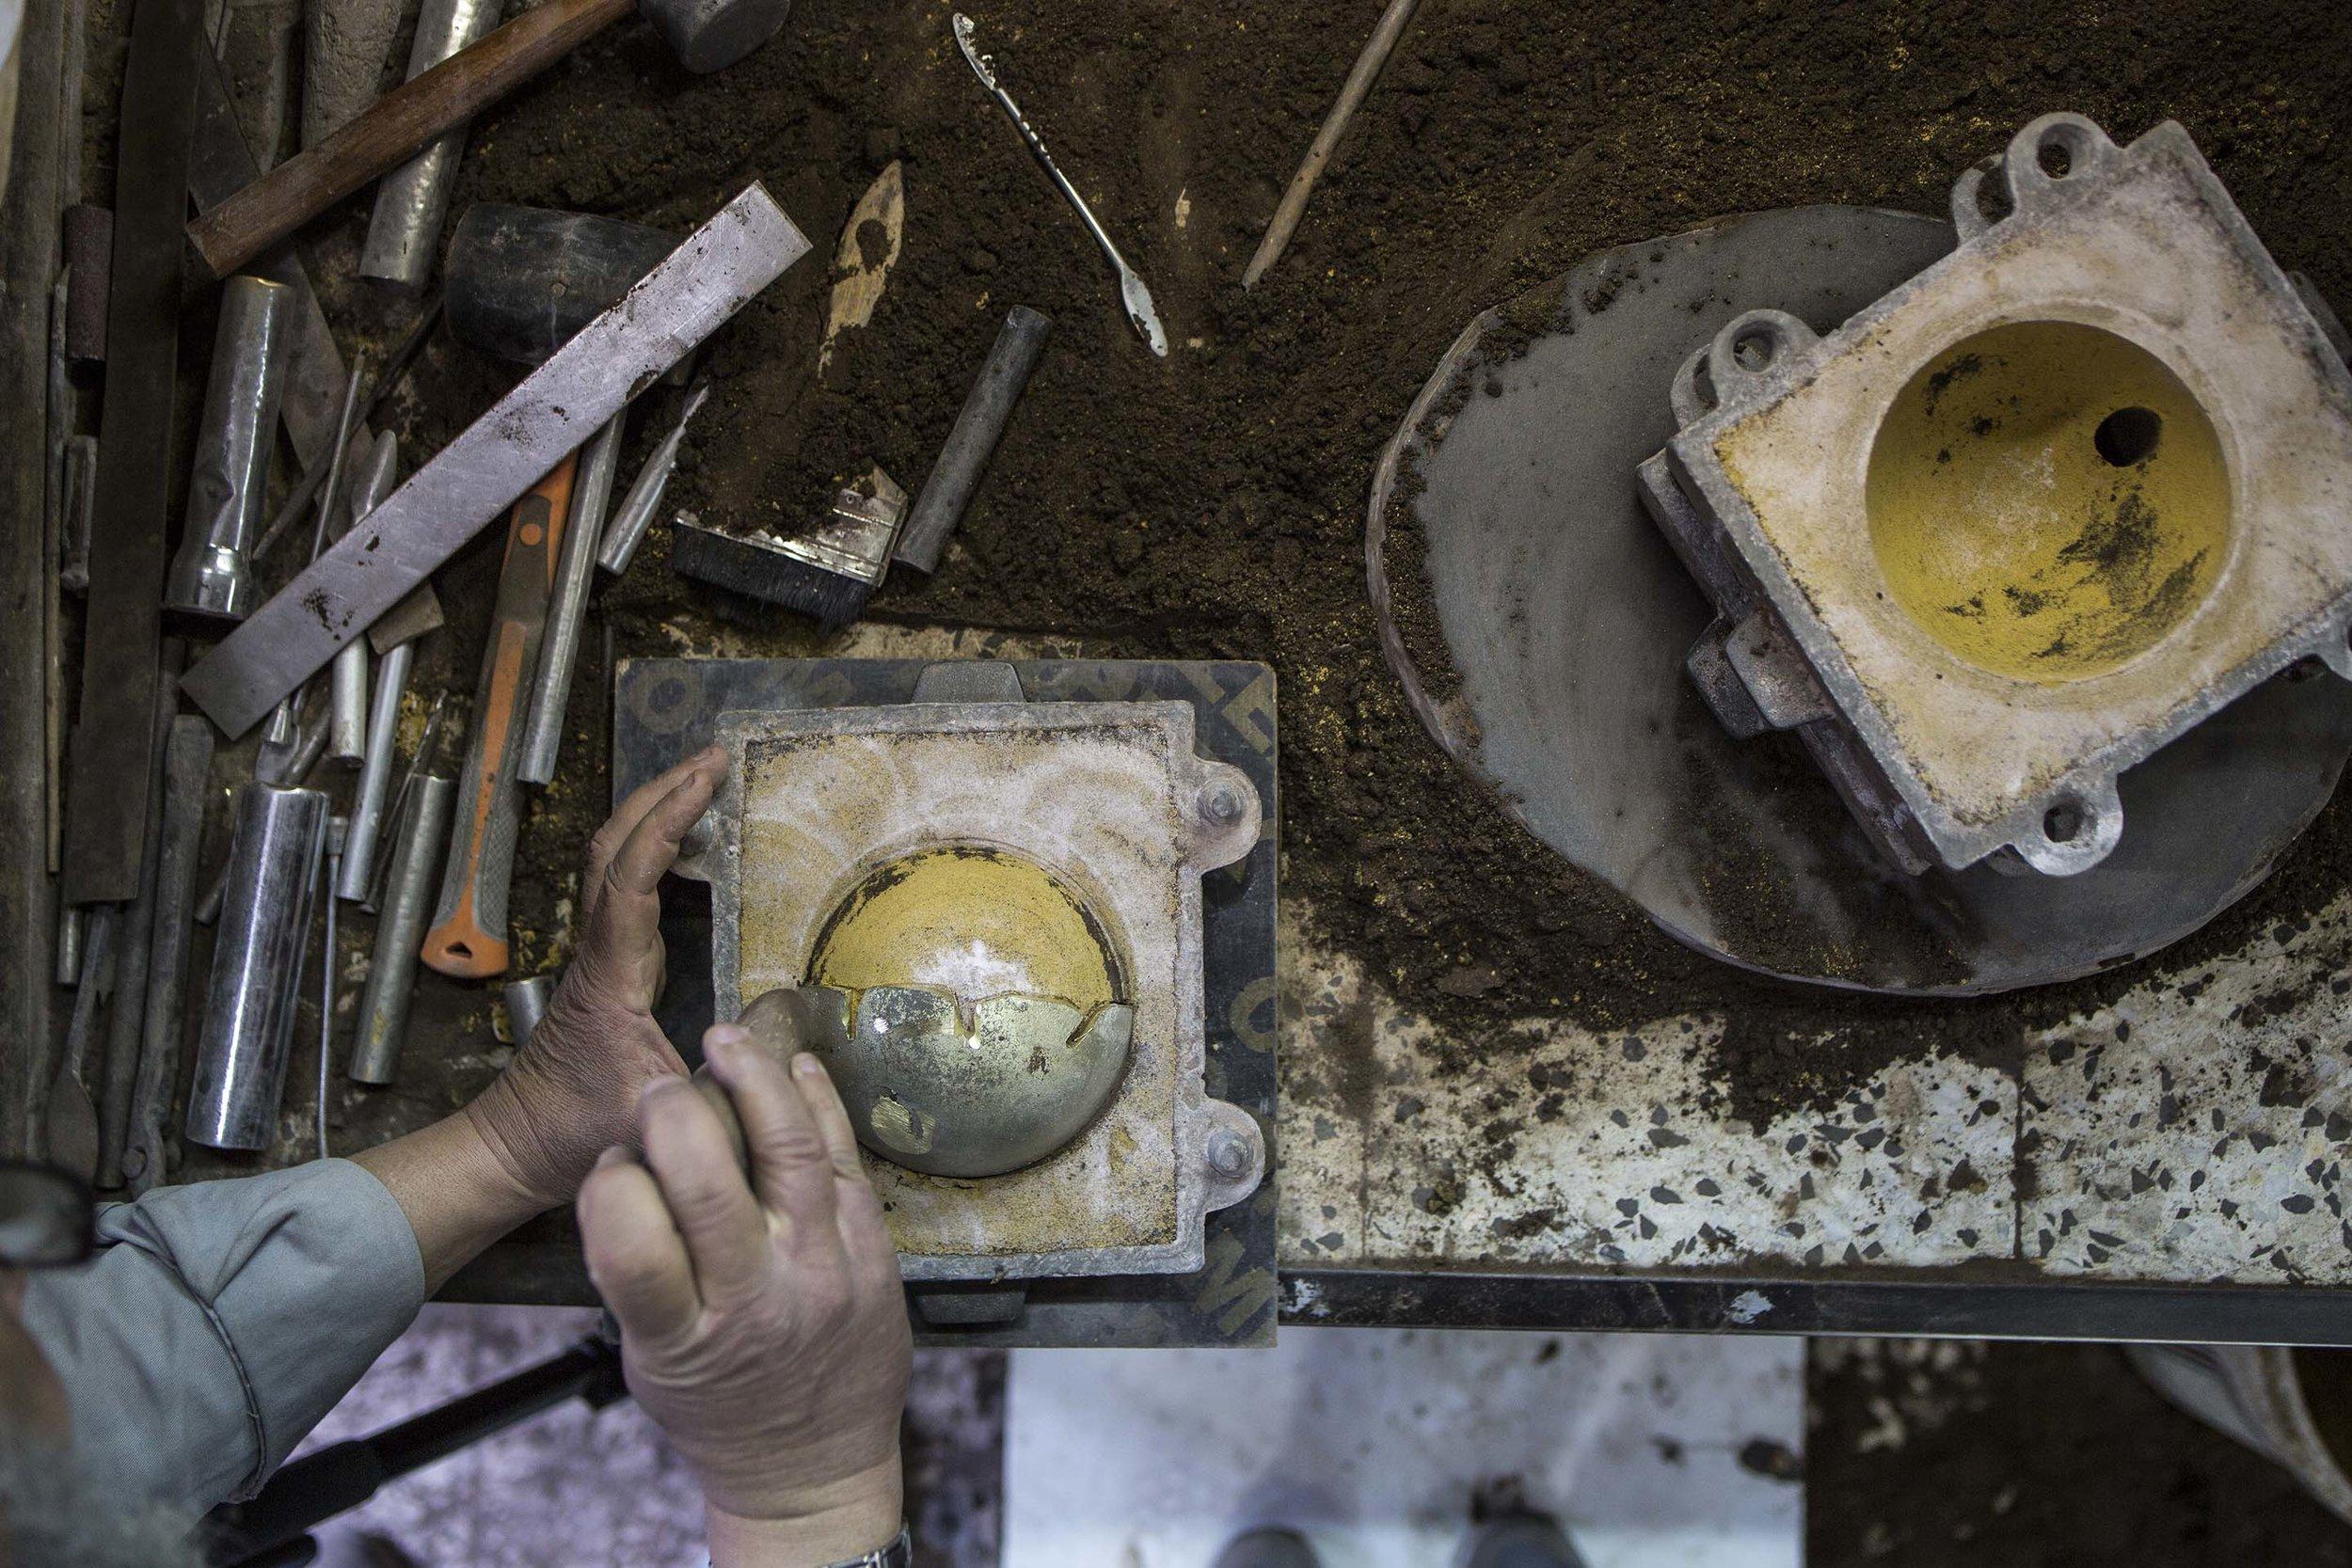 Dual Bowls  by Kawther Al Saffar, being cast by craftsmen at the Alwafi Foundry